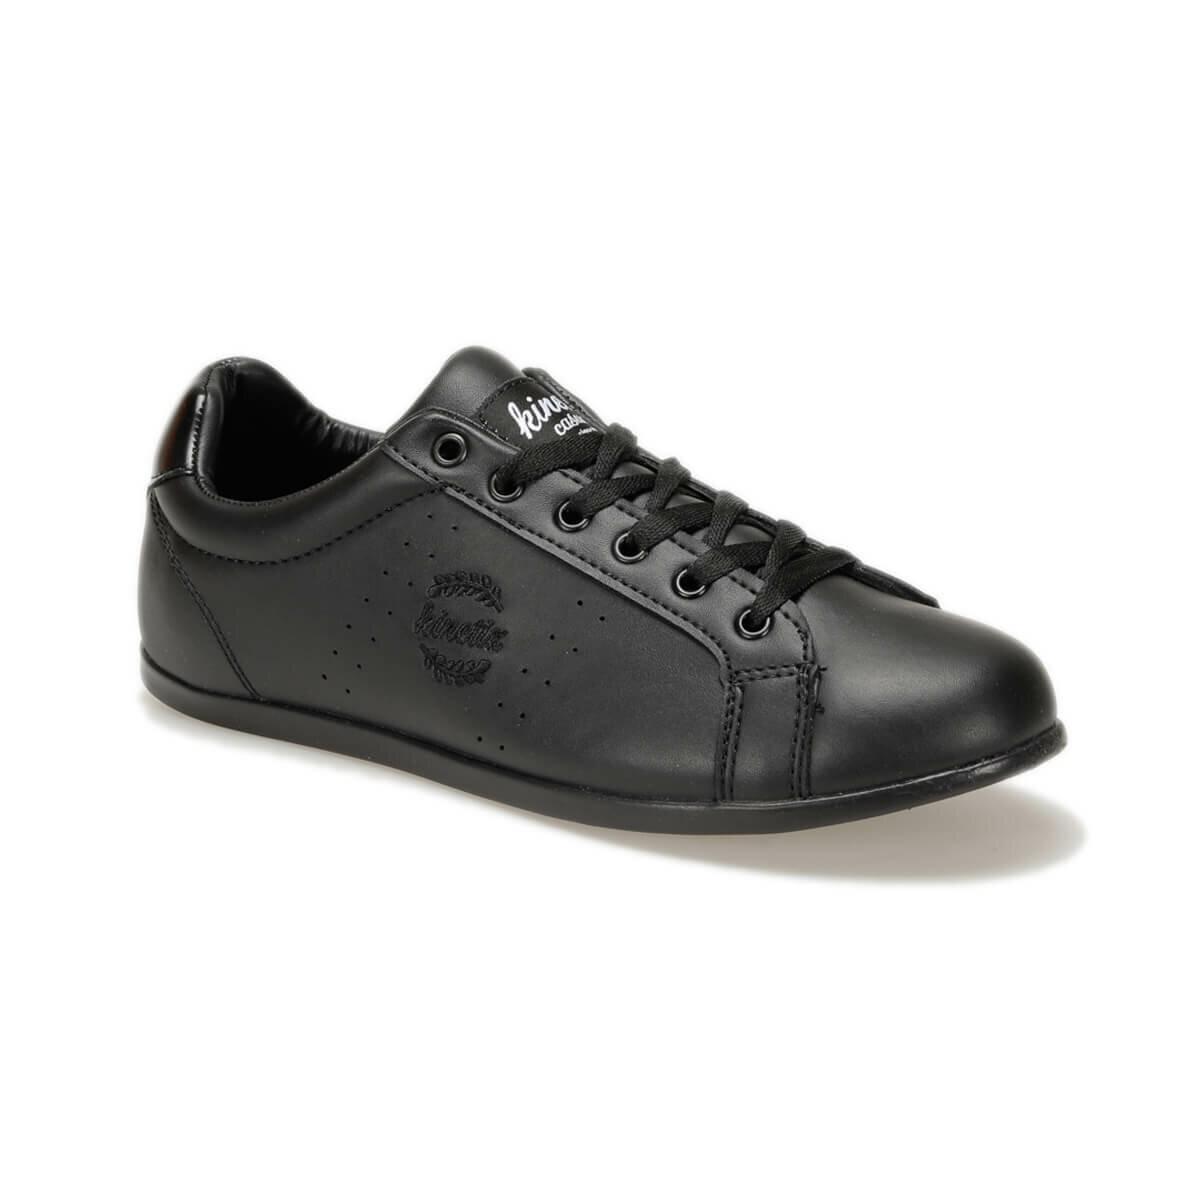 FLO YOKOHAMA Black Women 'S Sneaker Shoes KINETIX